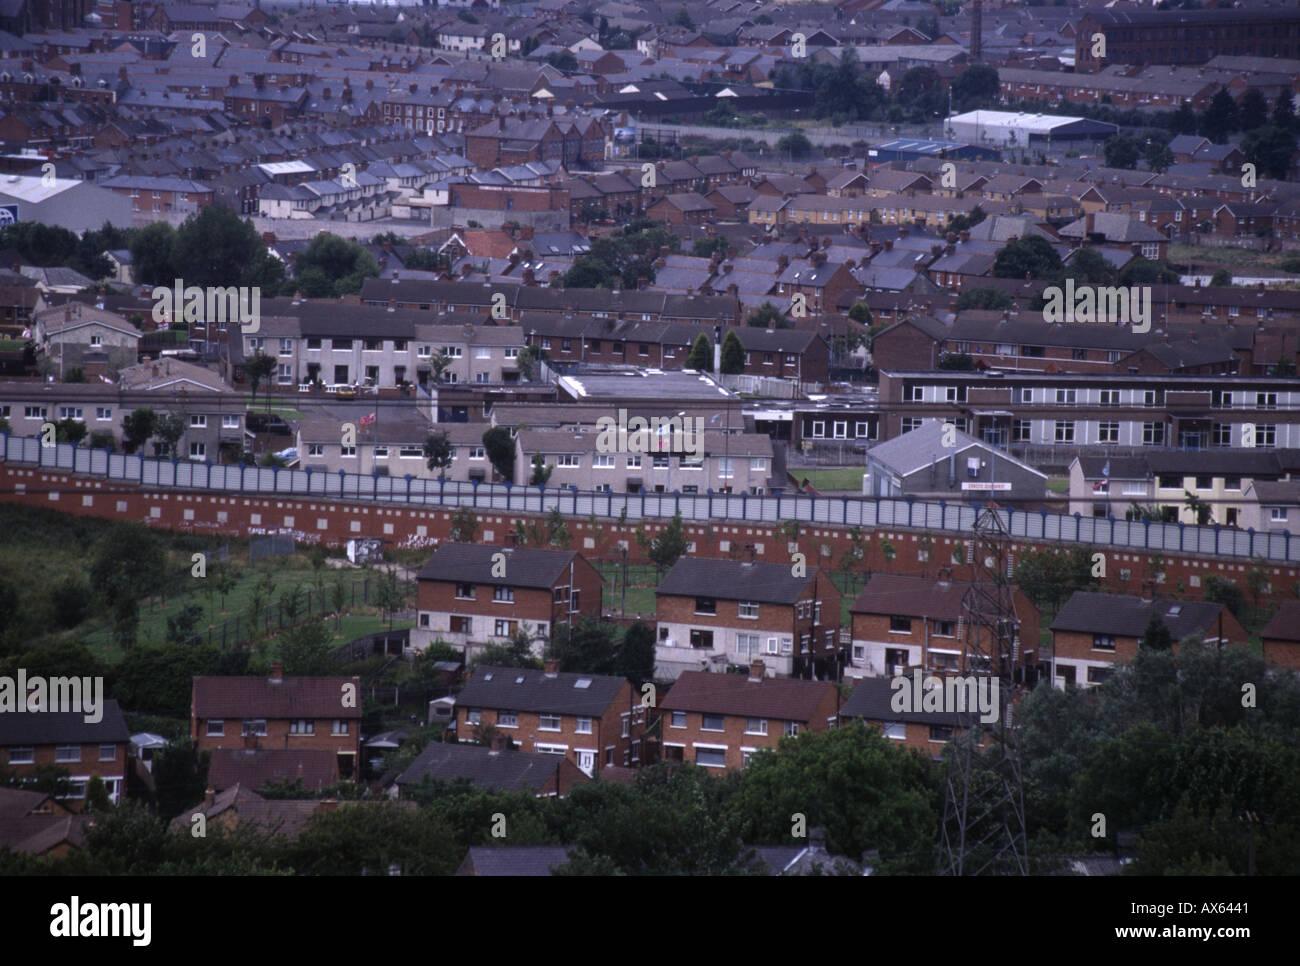 Belfast peace lines barricades, Belfast, N.Ireland, 05/07/2004 - Stock Image